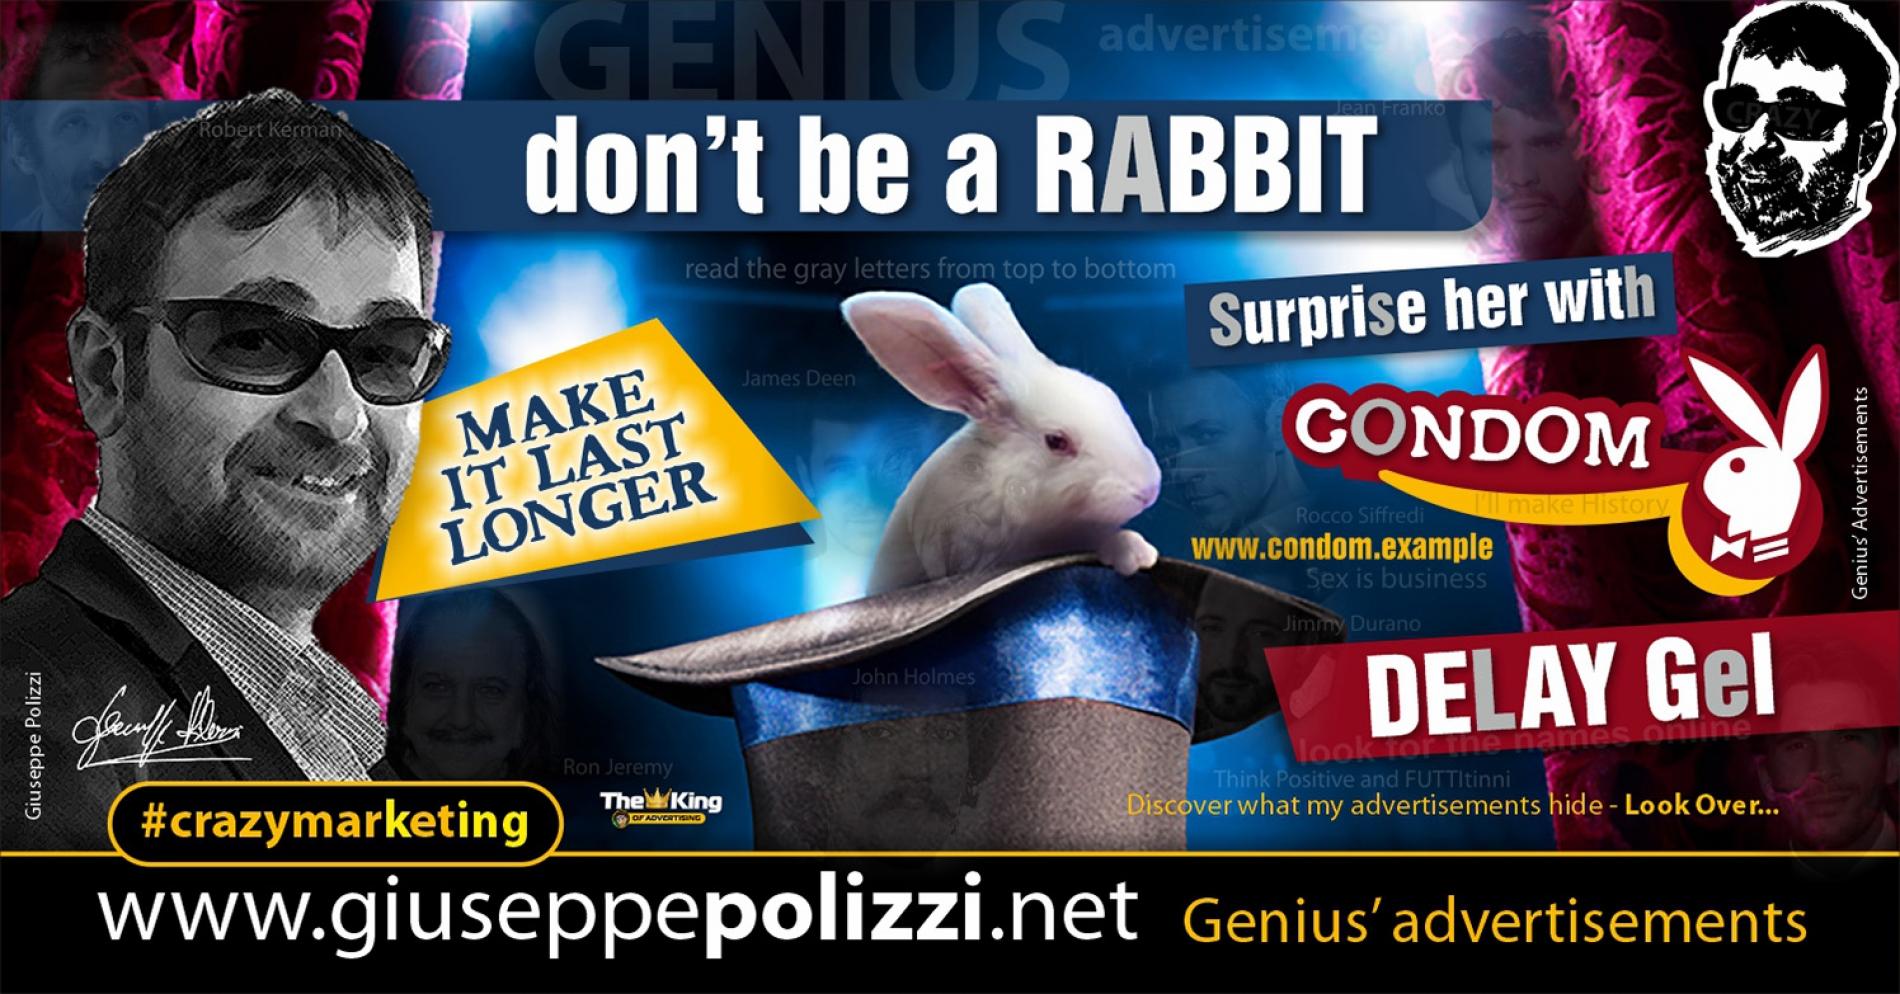 giuseppe polizzi crazymarketing Rabbit advertisements